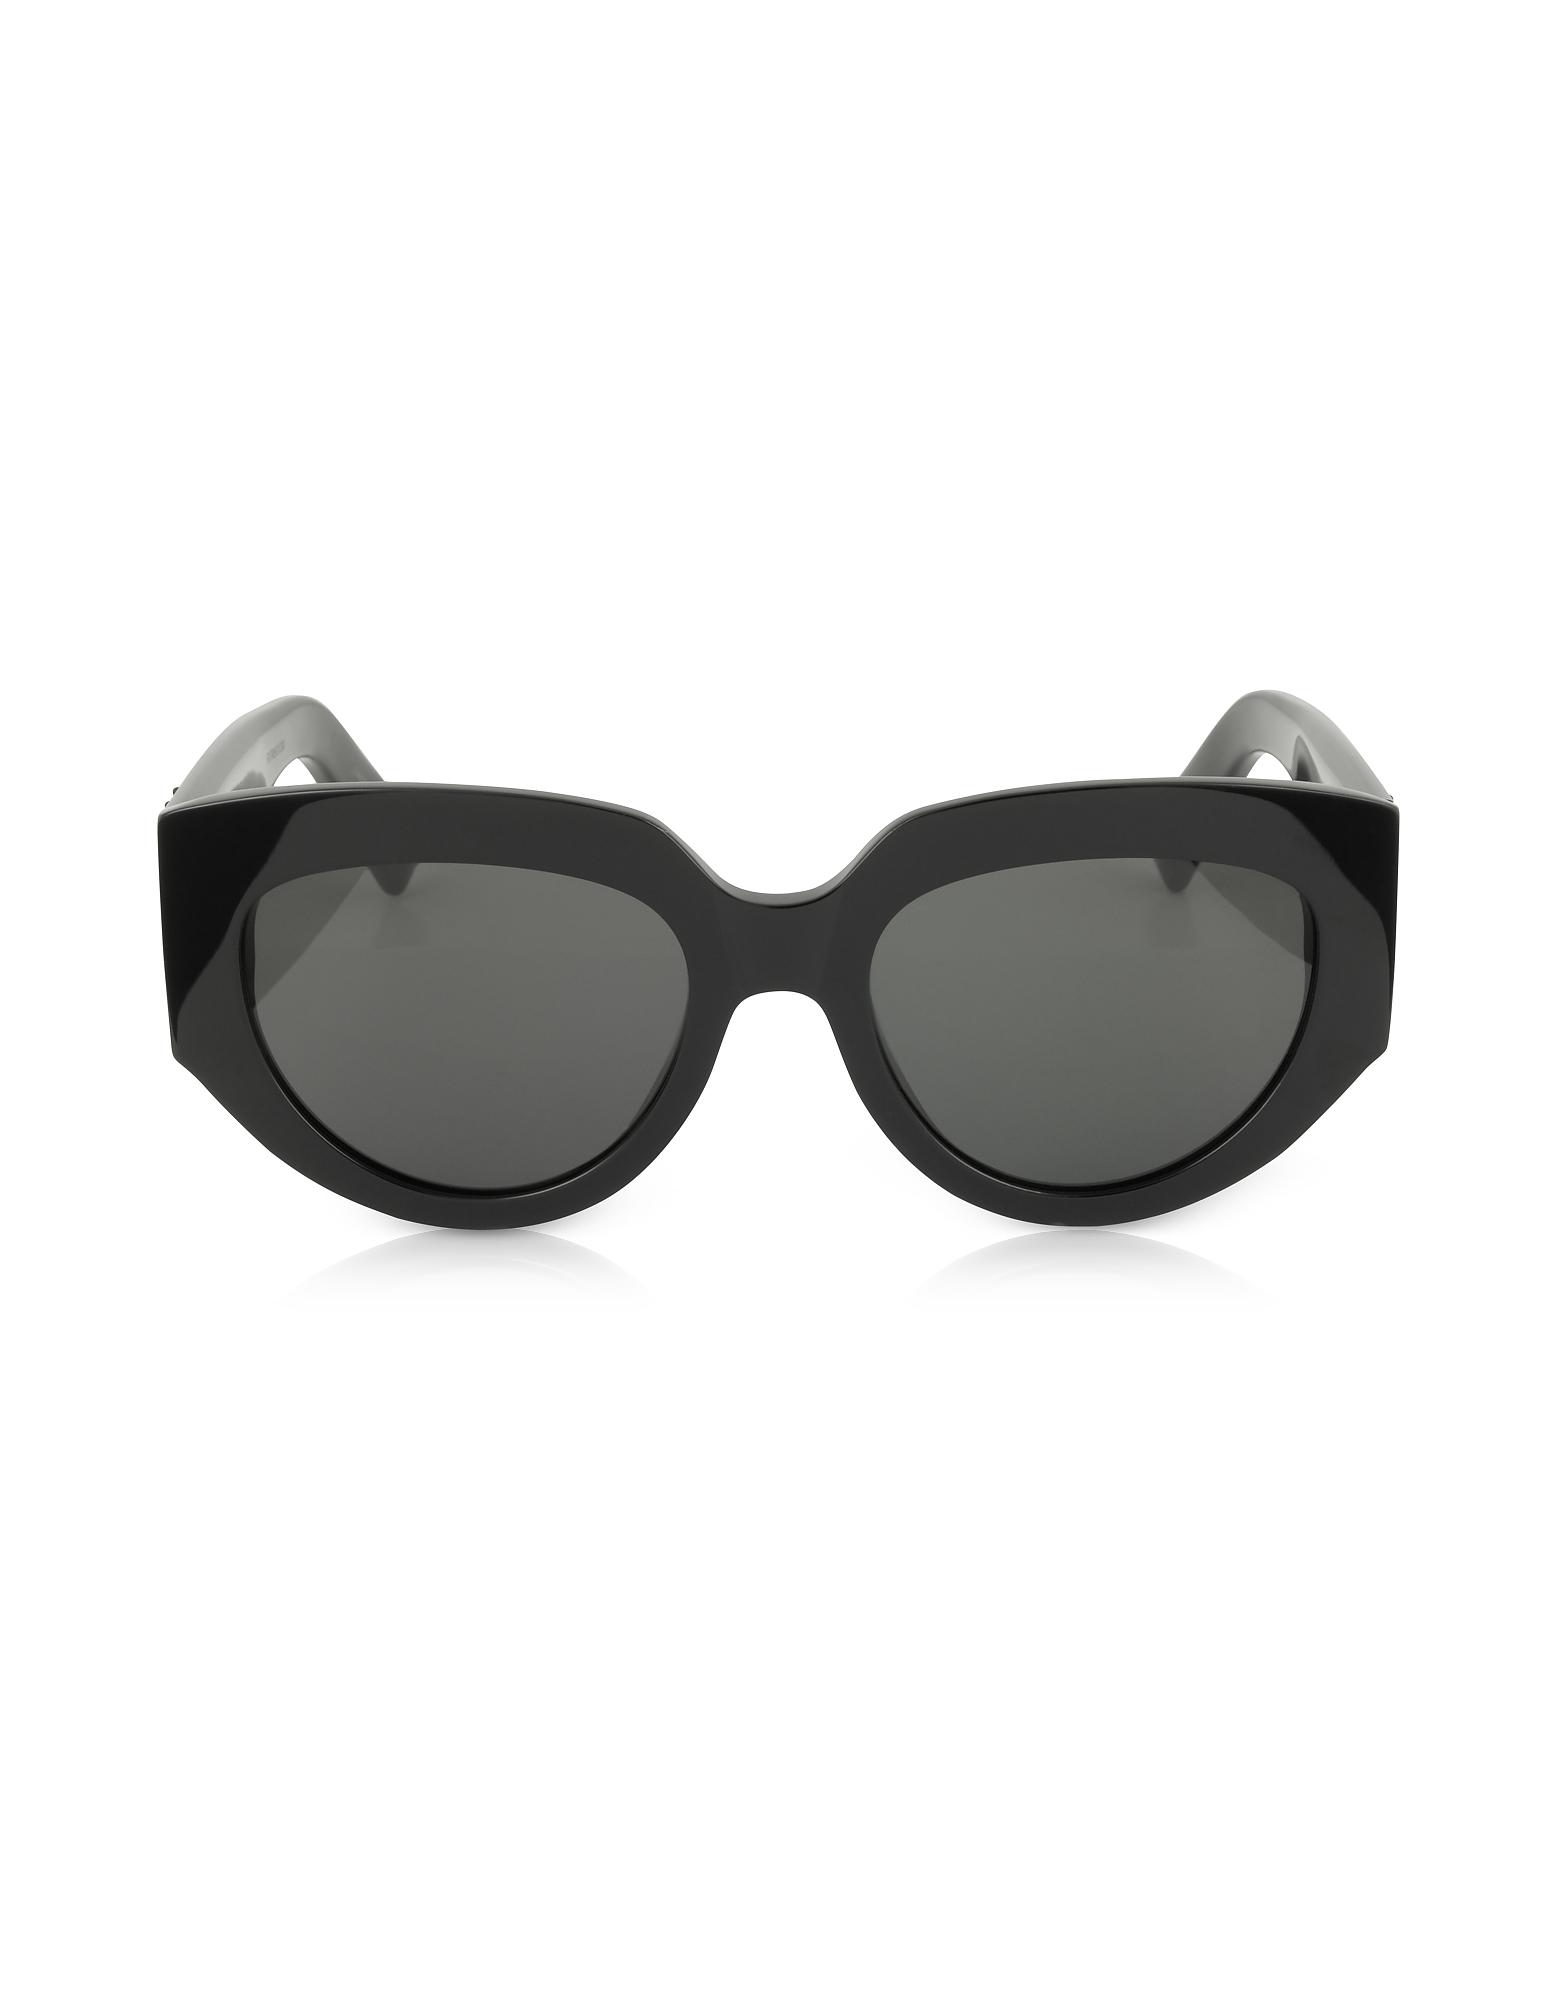 SL M26 ROPE Black Acetate Square Cat-Eye Frame Sunglasses